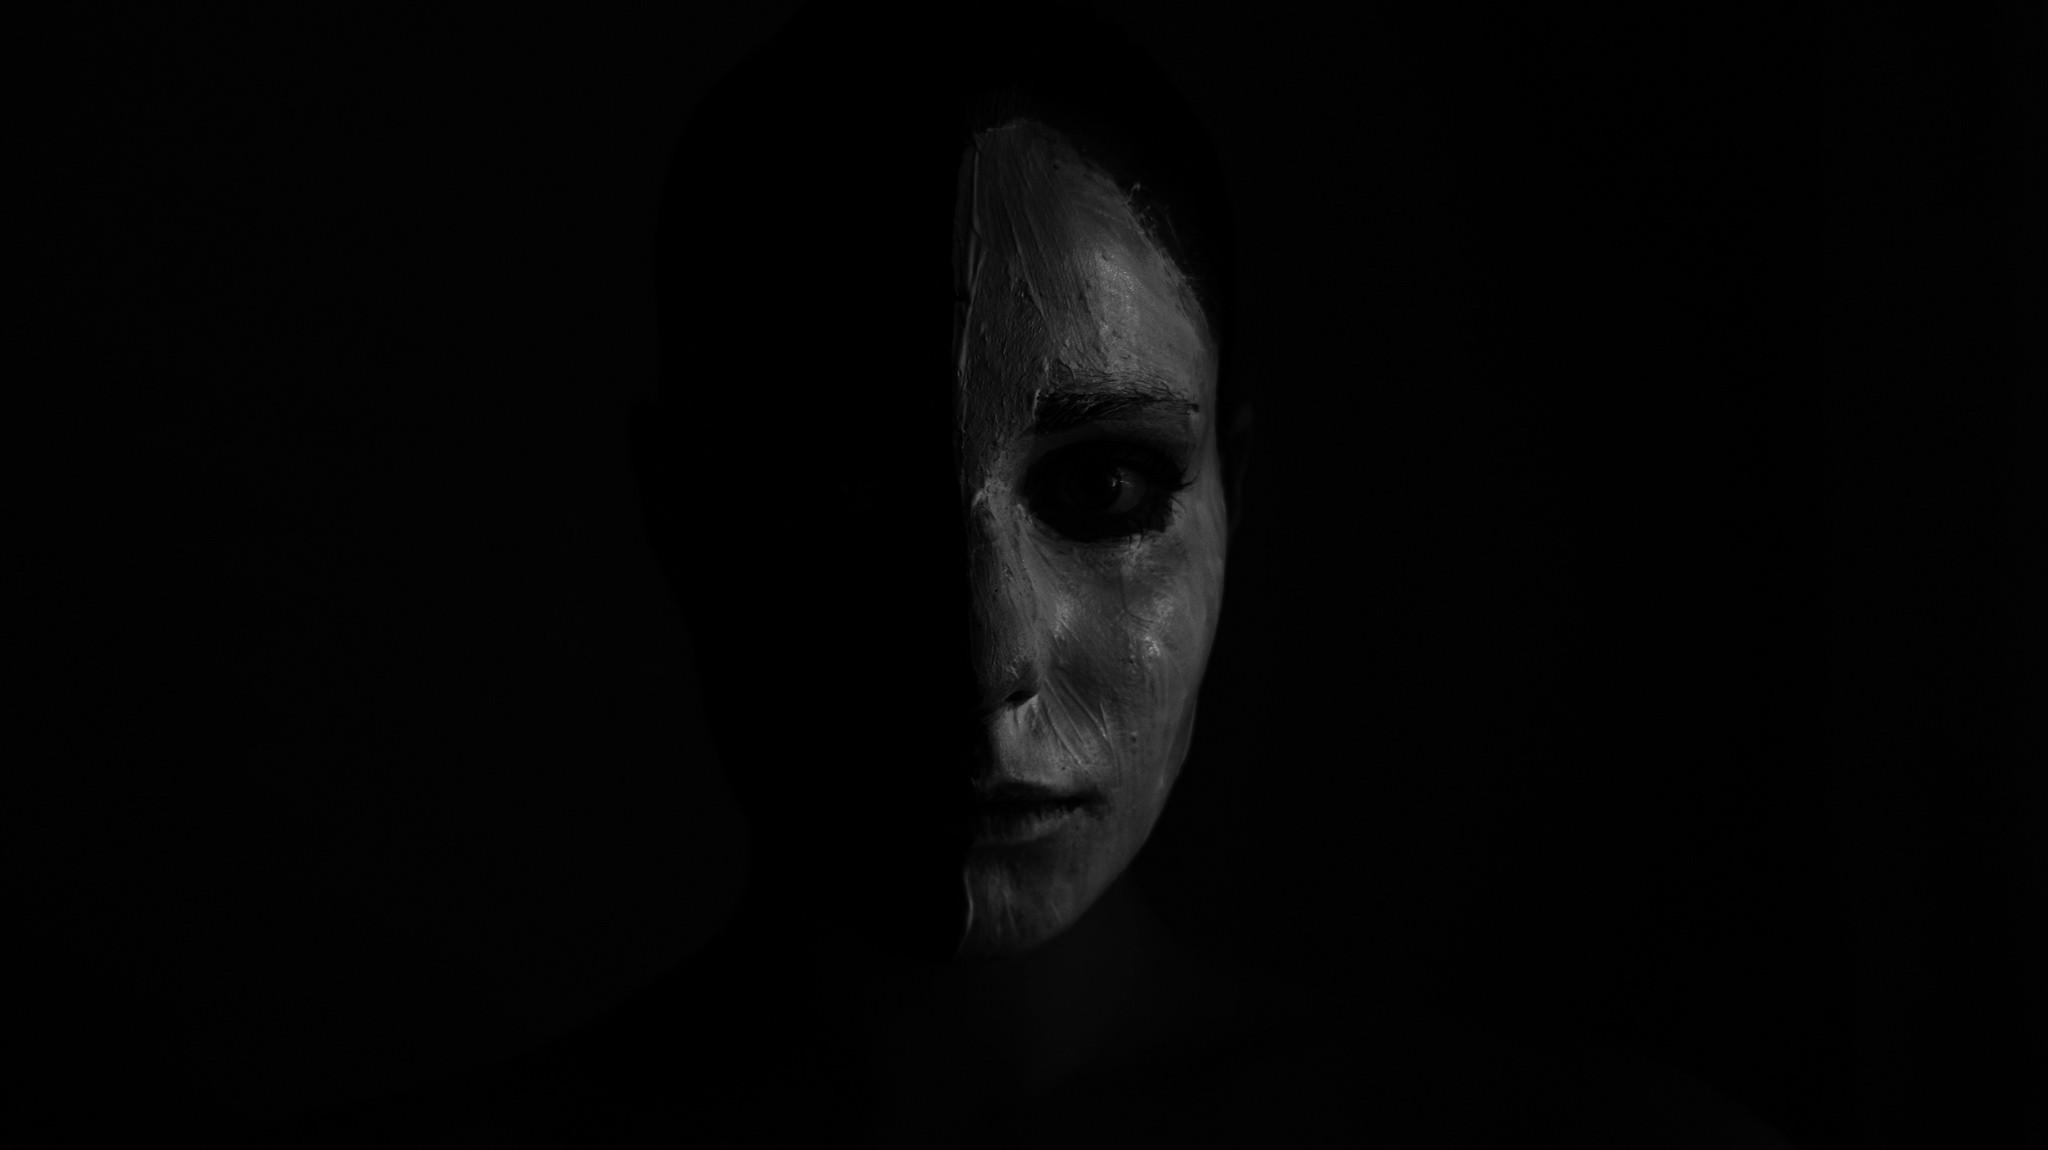 Картинки страшная темнота